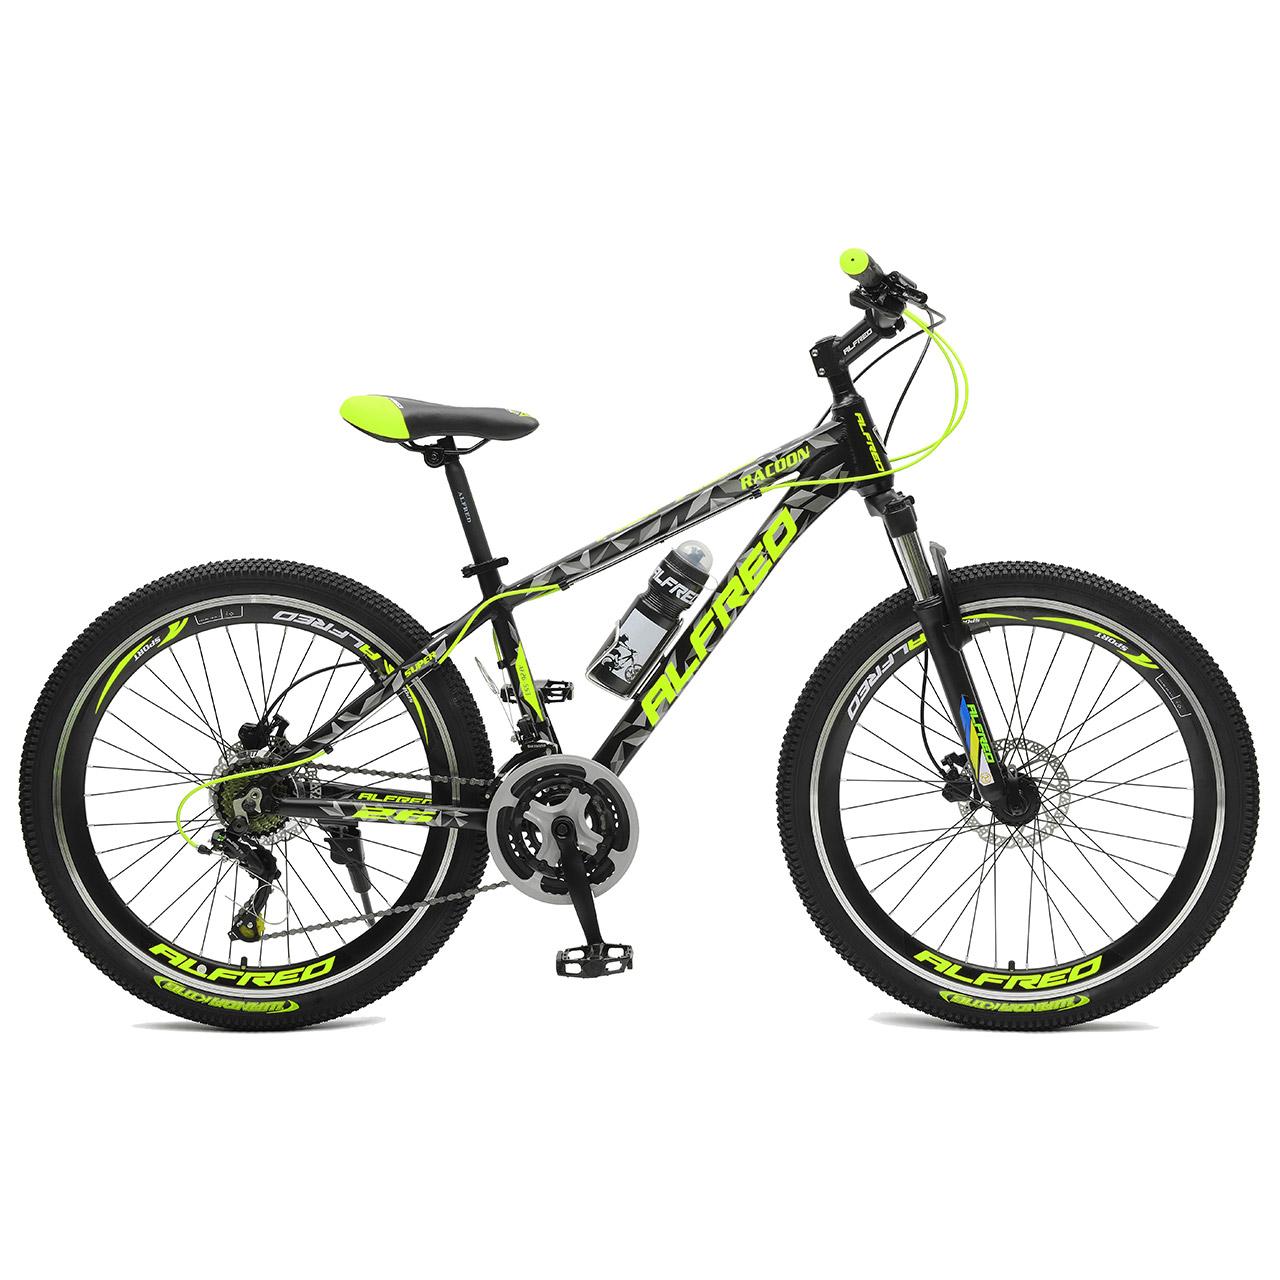 دوچرخه کوهستان آلفرد مدل Racoon سایز 26